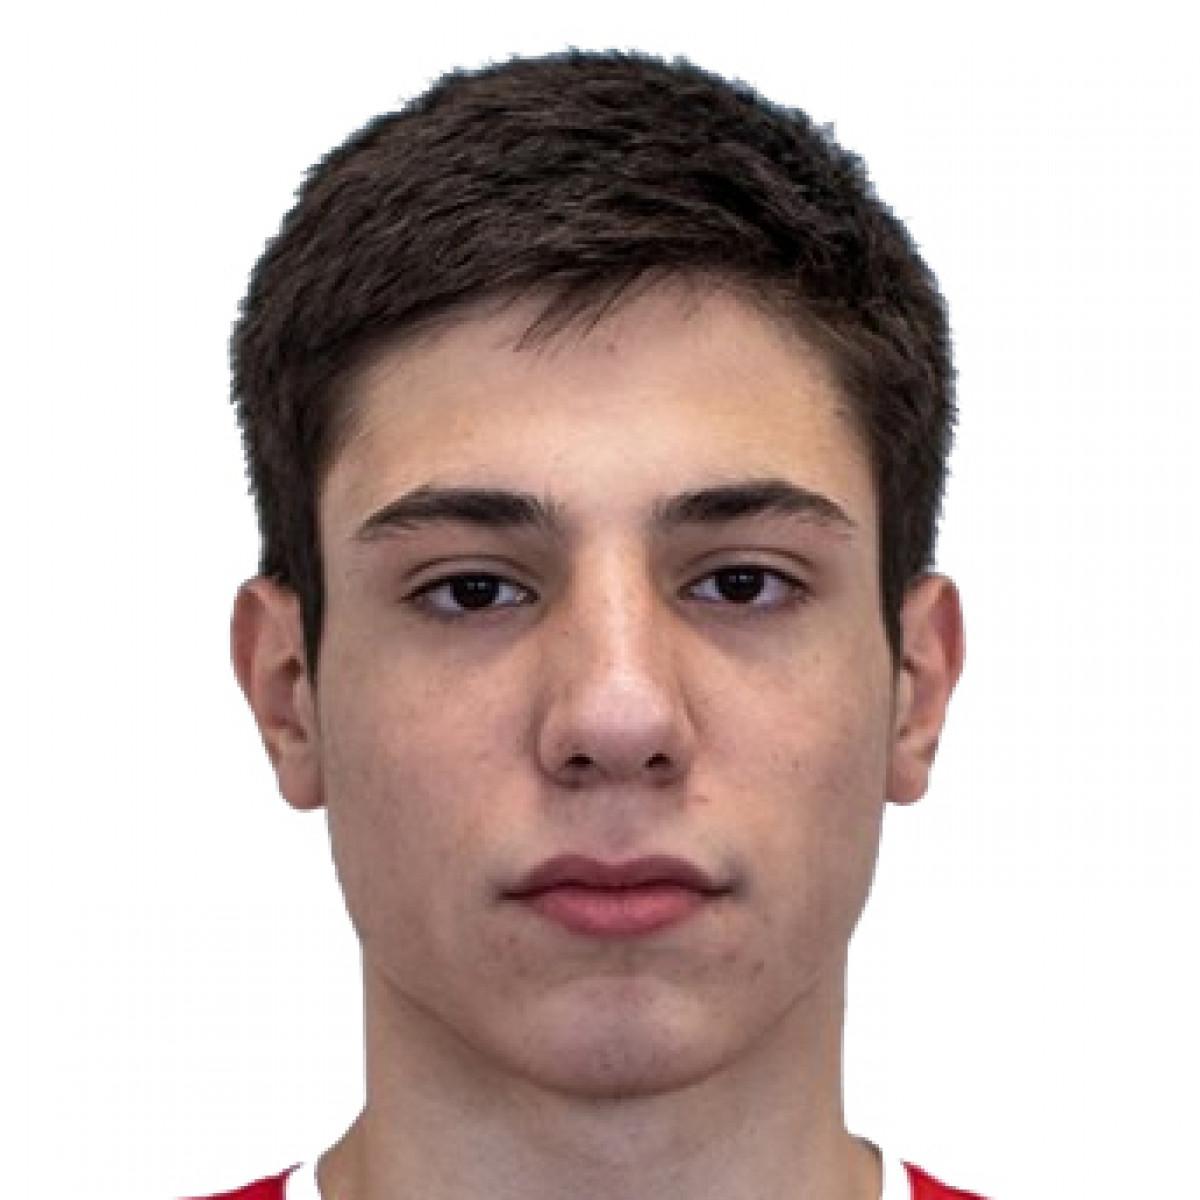 Giorgi Makhniashvili